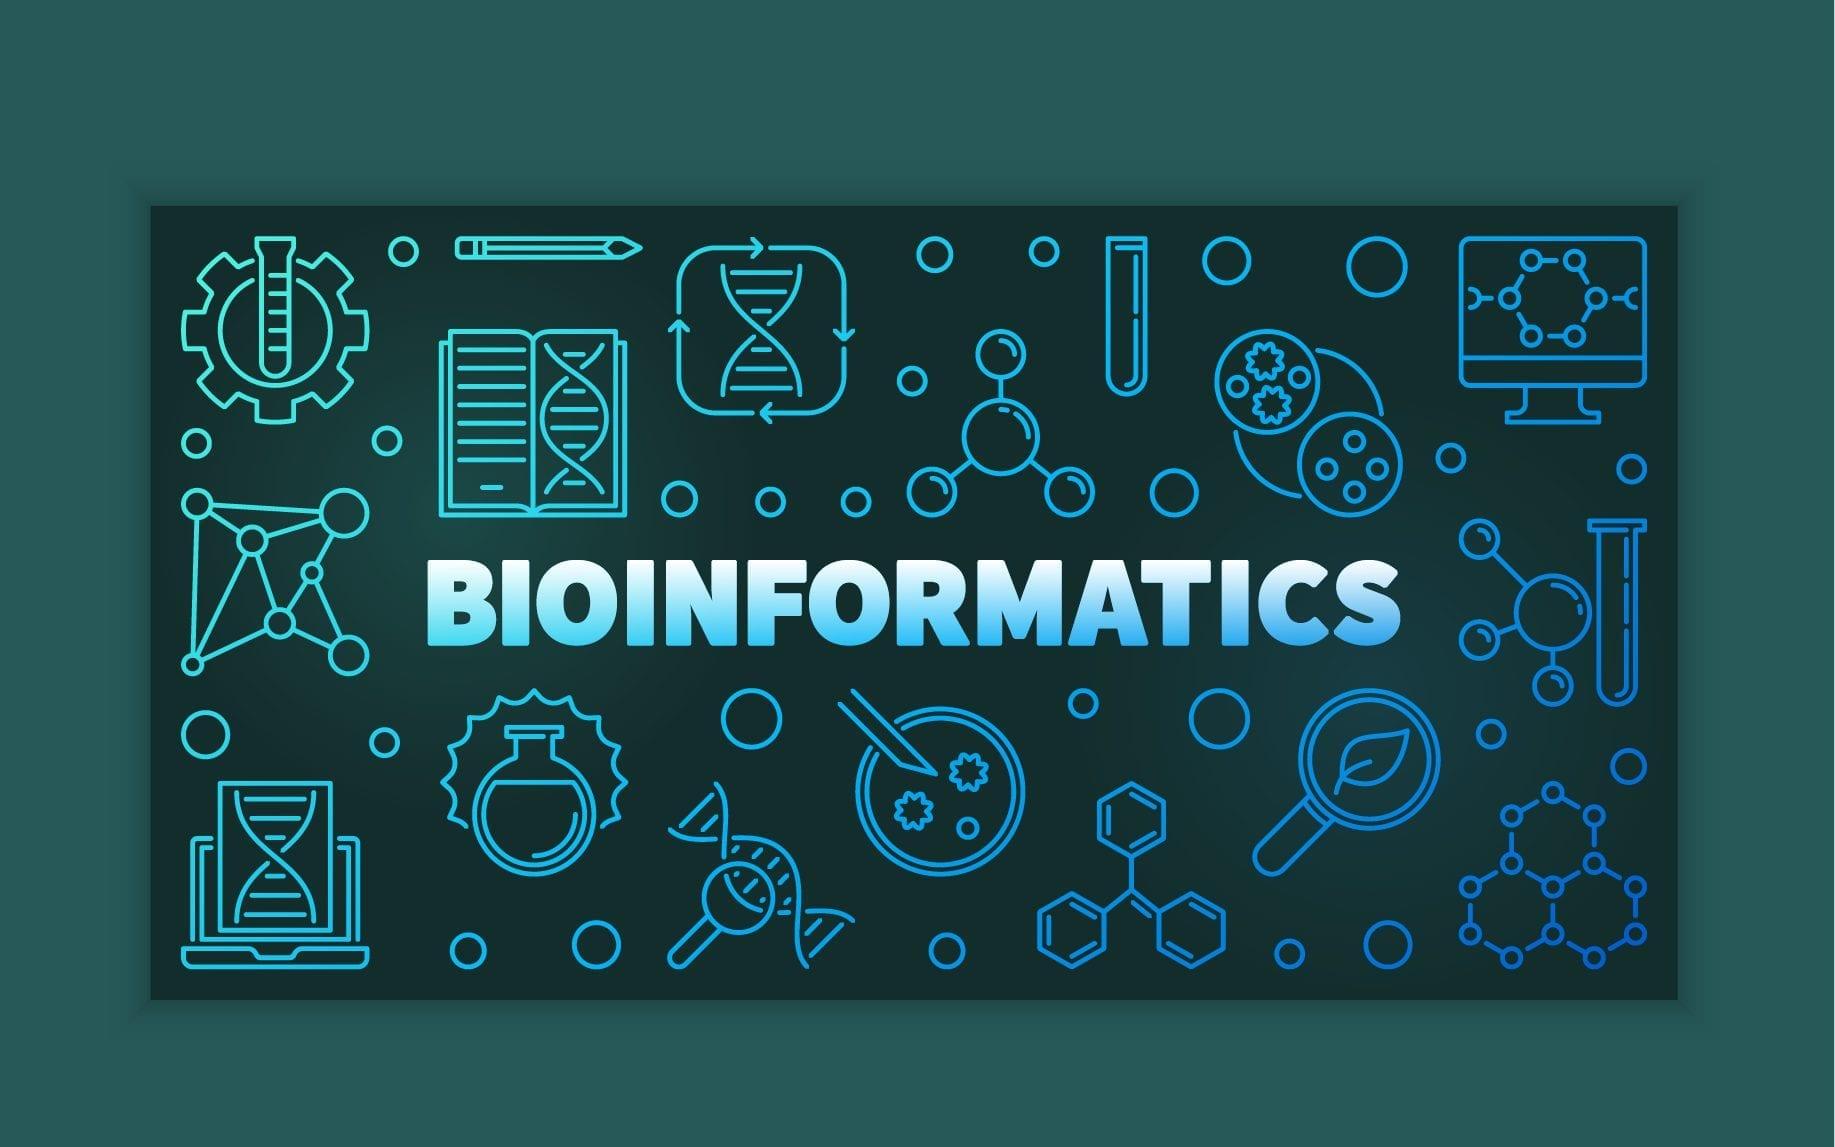 Application of Bioinformatics in Pharmacy, Medicine & Health - Leverage Edu